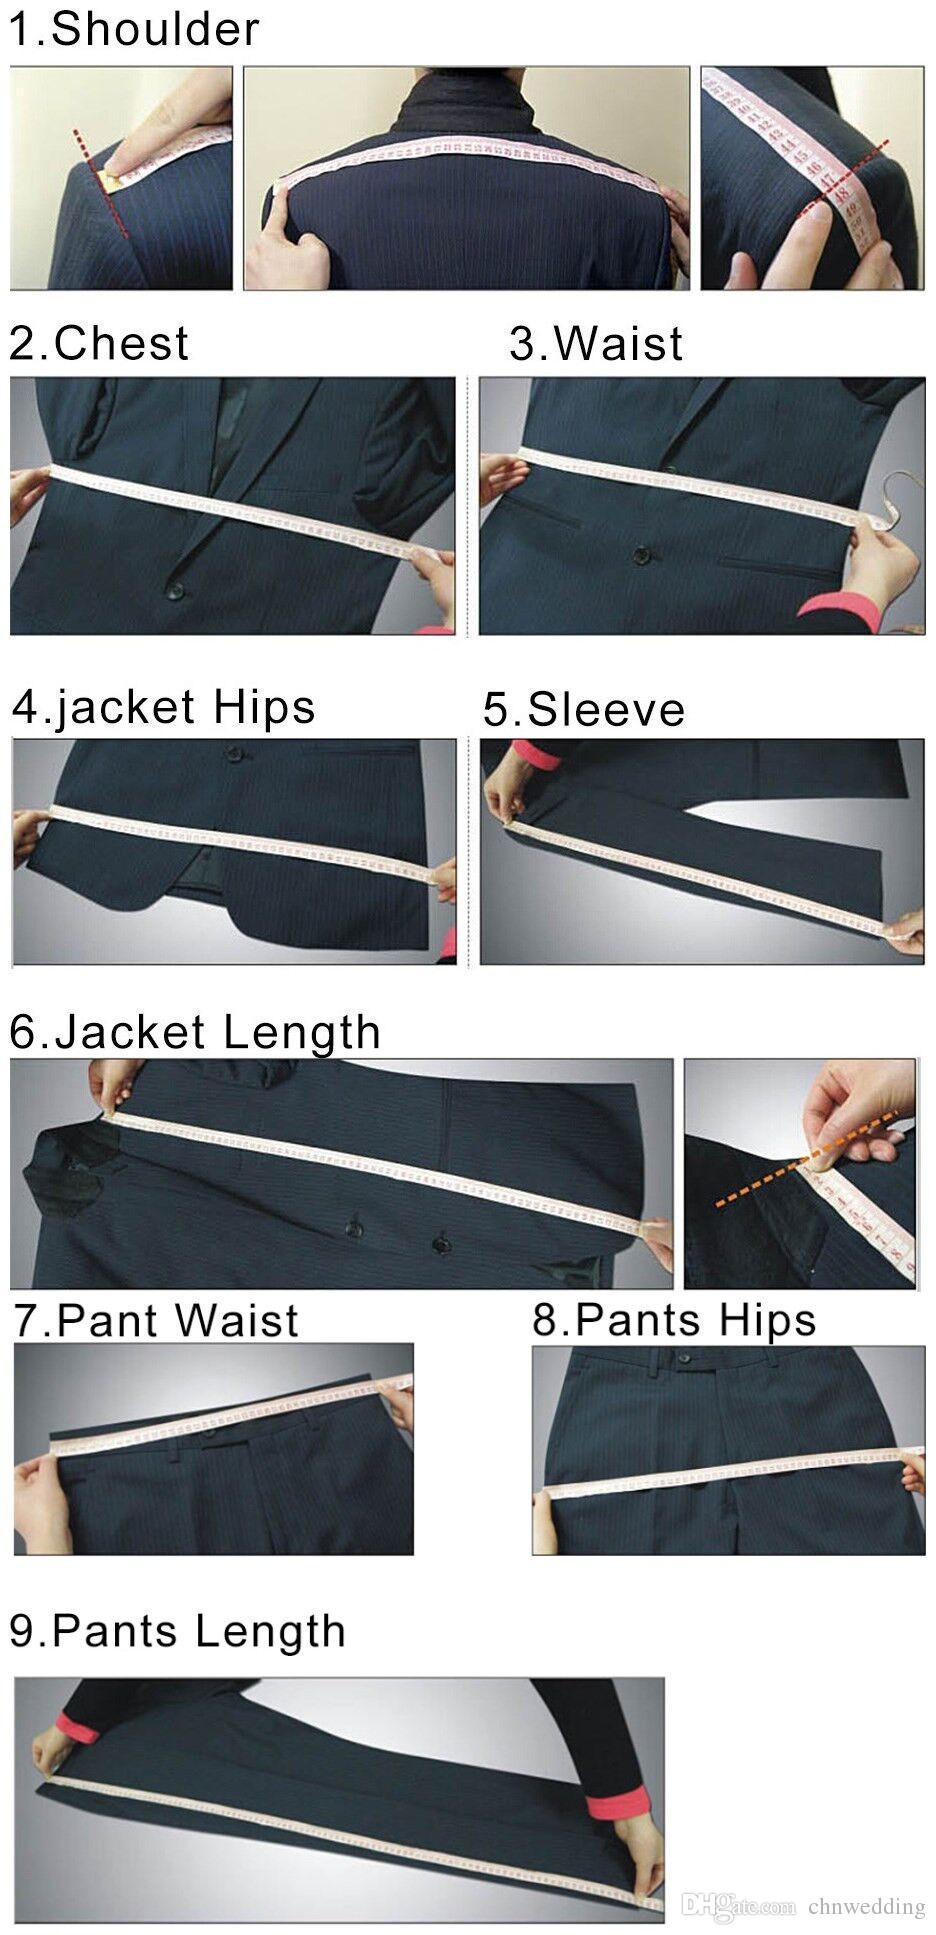 Özel Son Pantolon Ceket Keten Rahat Erkekler Suits 2018 Yaz Plaj Smokin Basit 2 Parça Blazers Ceket + Pantolon